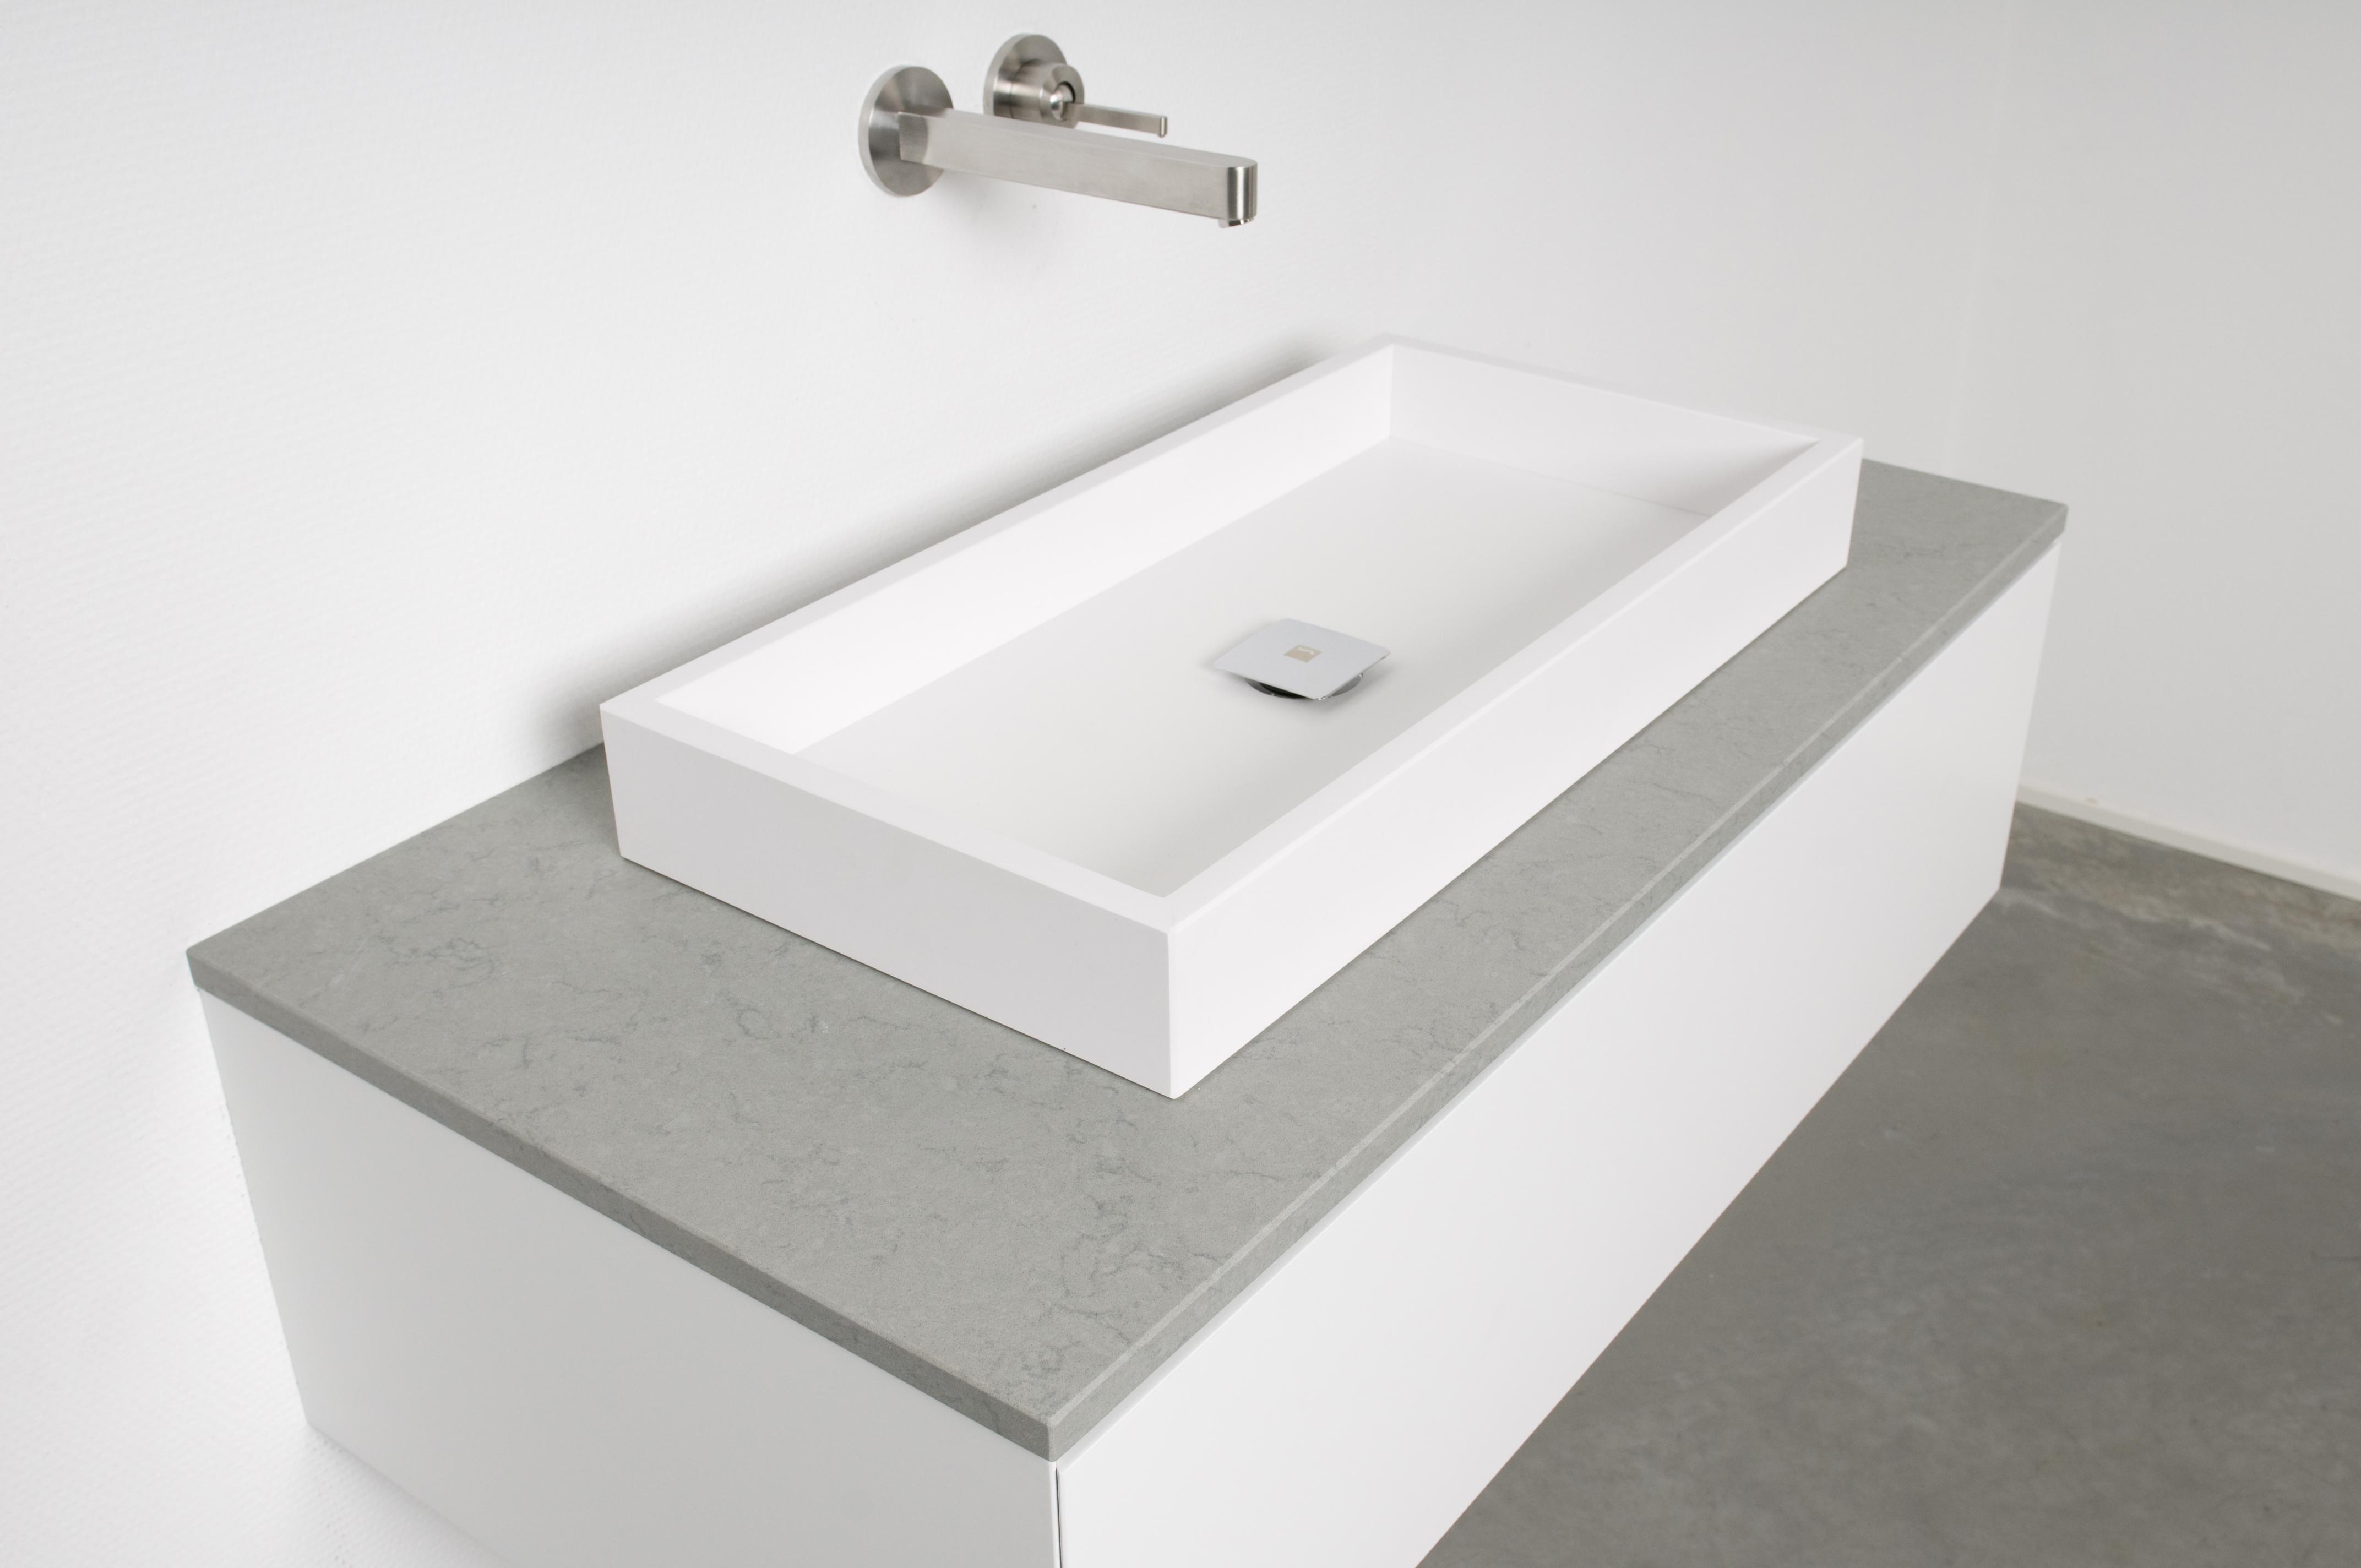 Badkamermeubel zonder wasbak u e wibma ontwerp